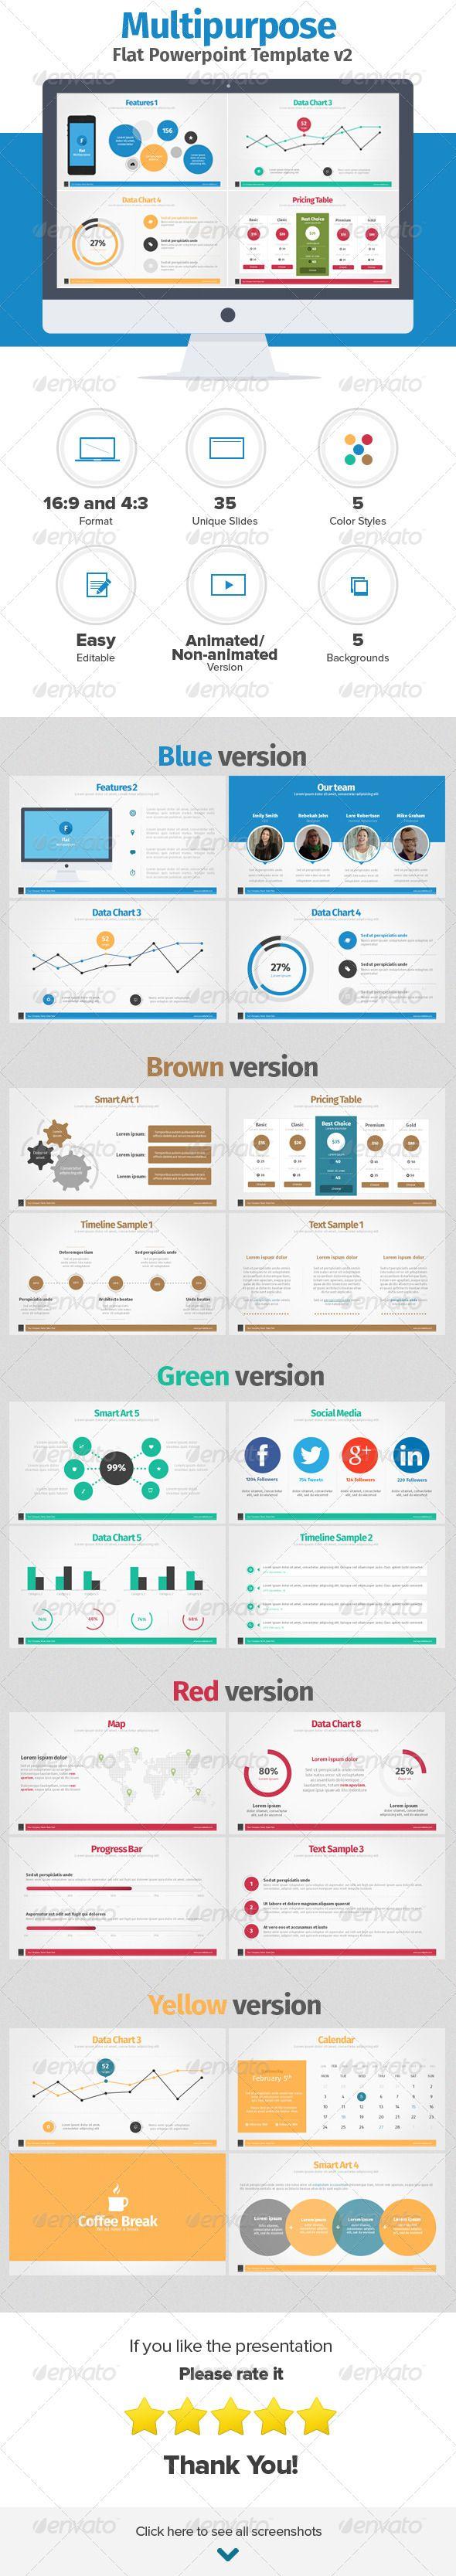 dynamic powerpoint presentations